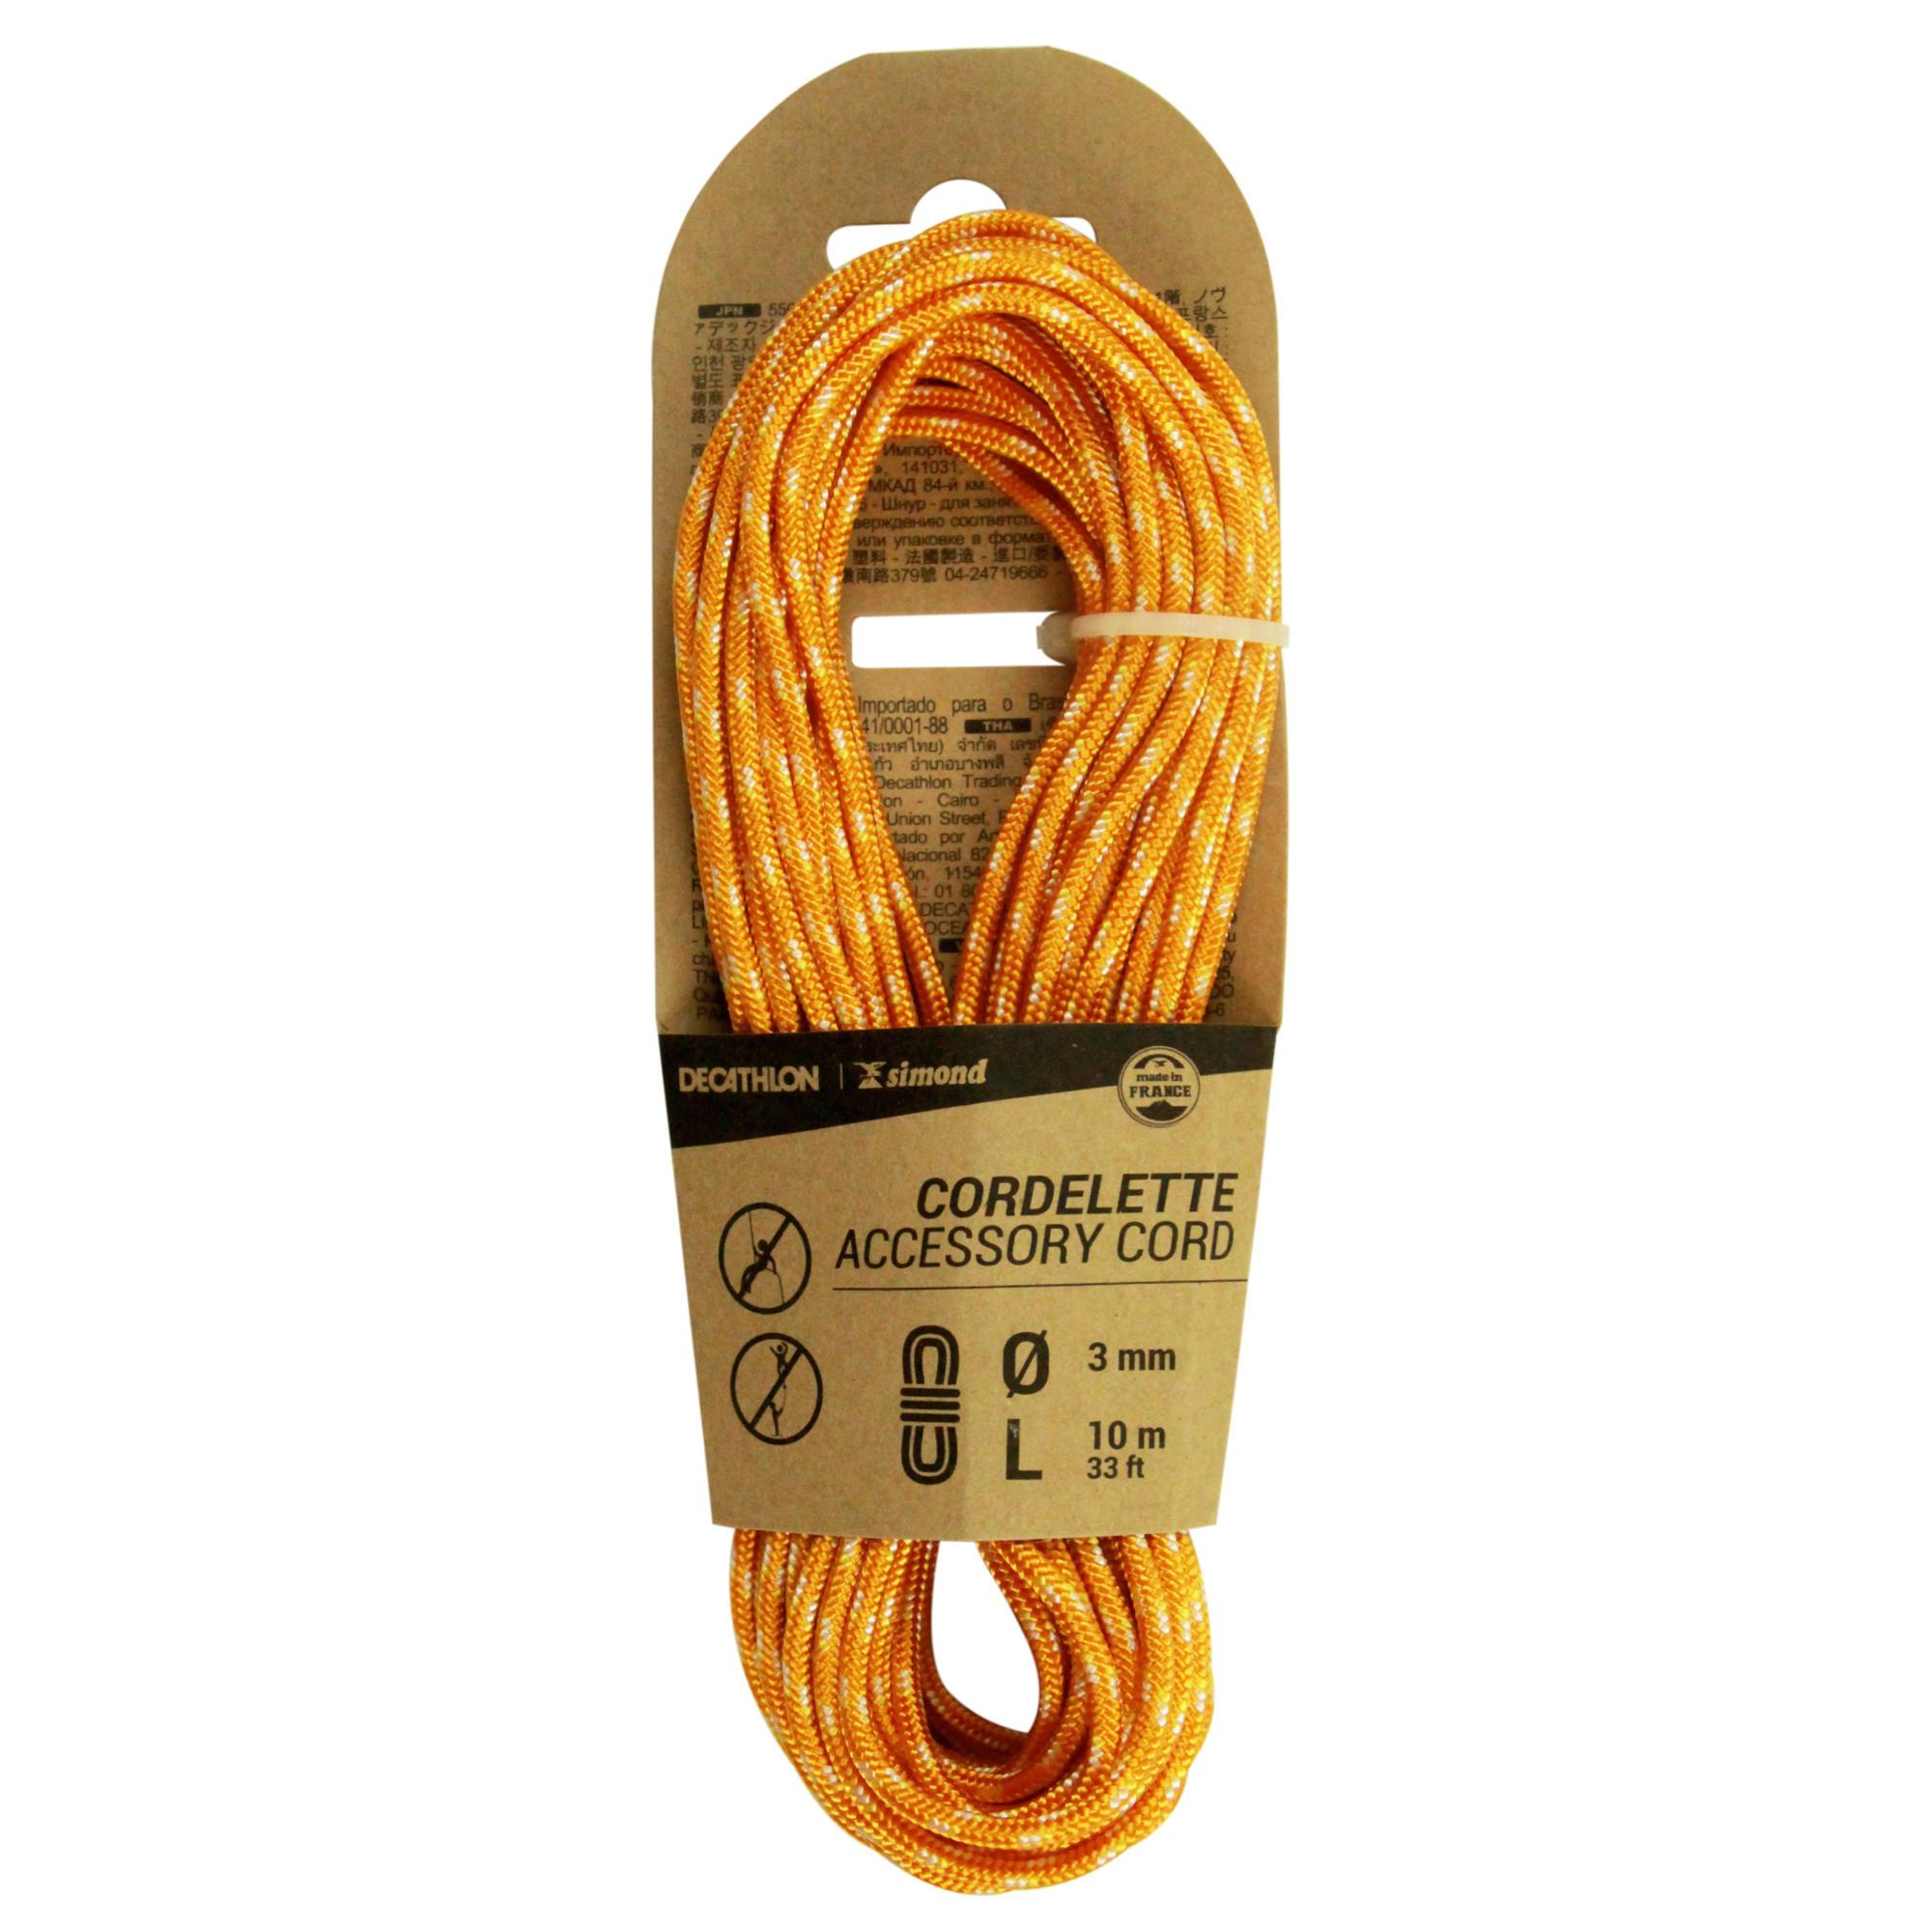 3 mm x 10 m Cord